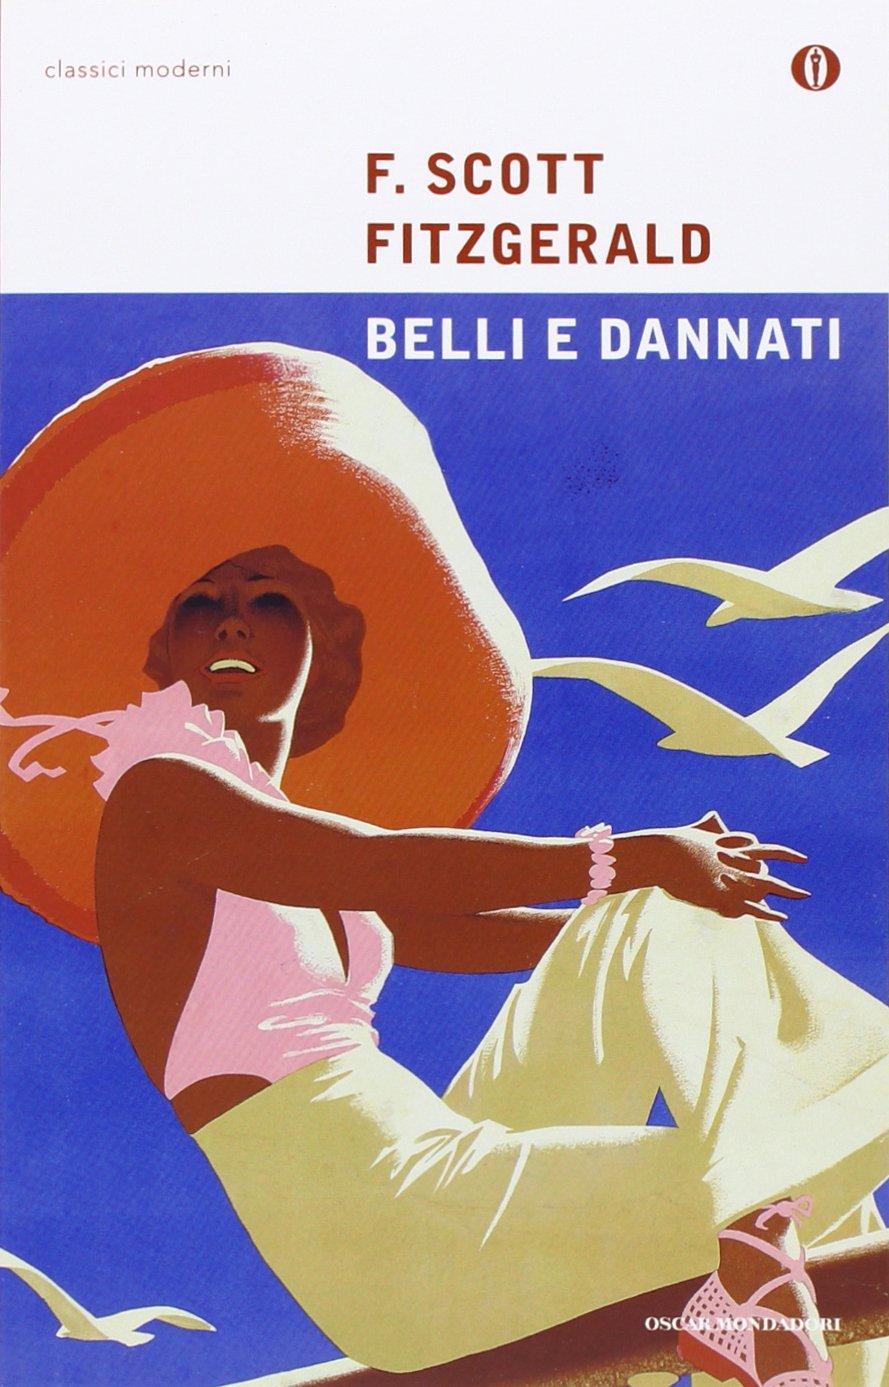 belli e dannati fitzgerald  : Belli e dannati - Francis Scott Fitzgerald, F. Pivano - Libri